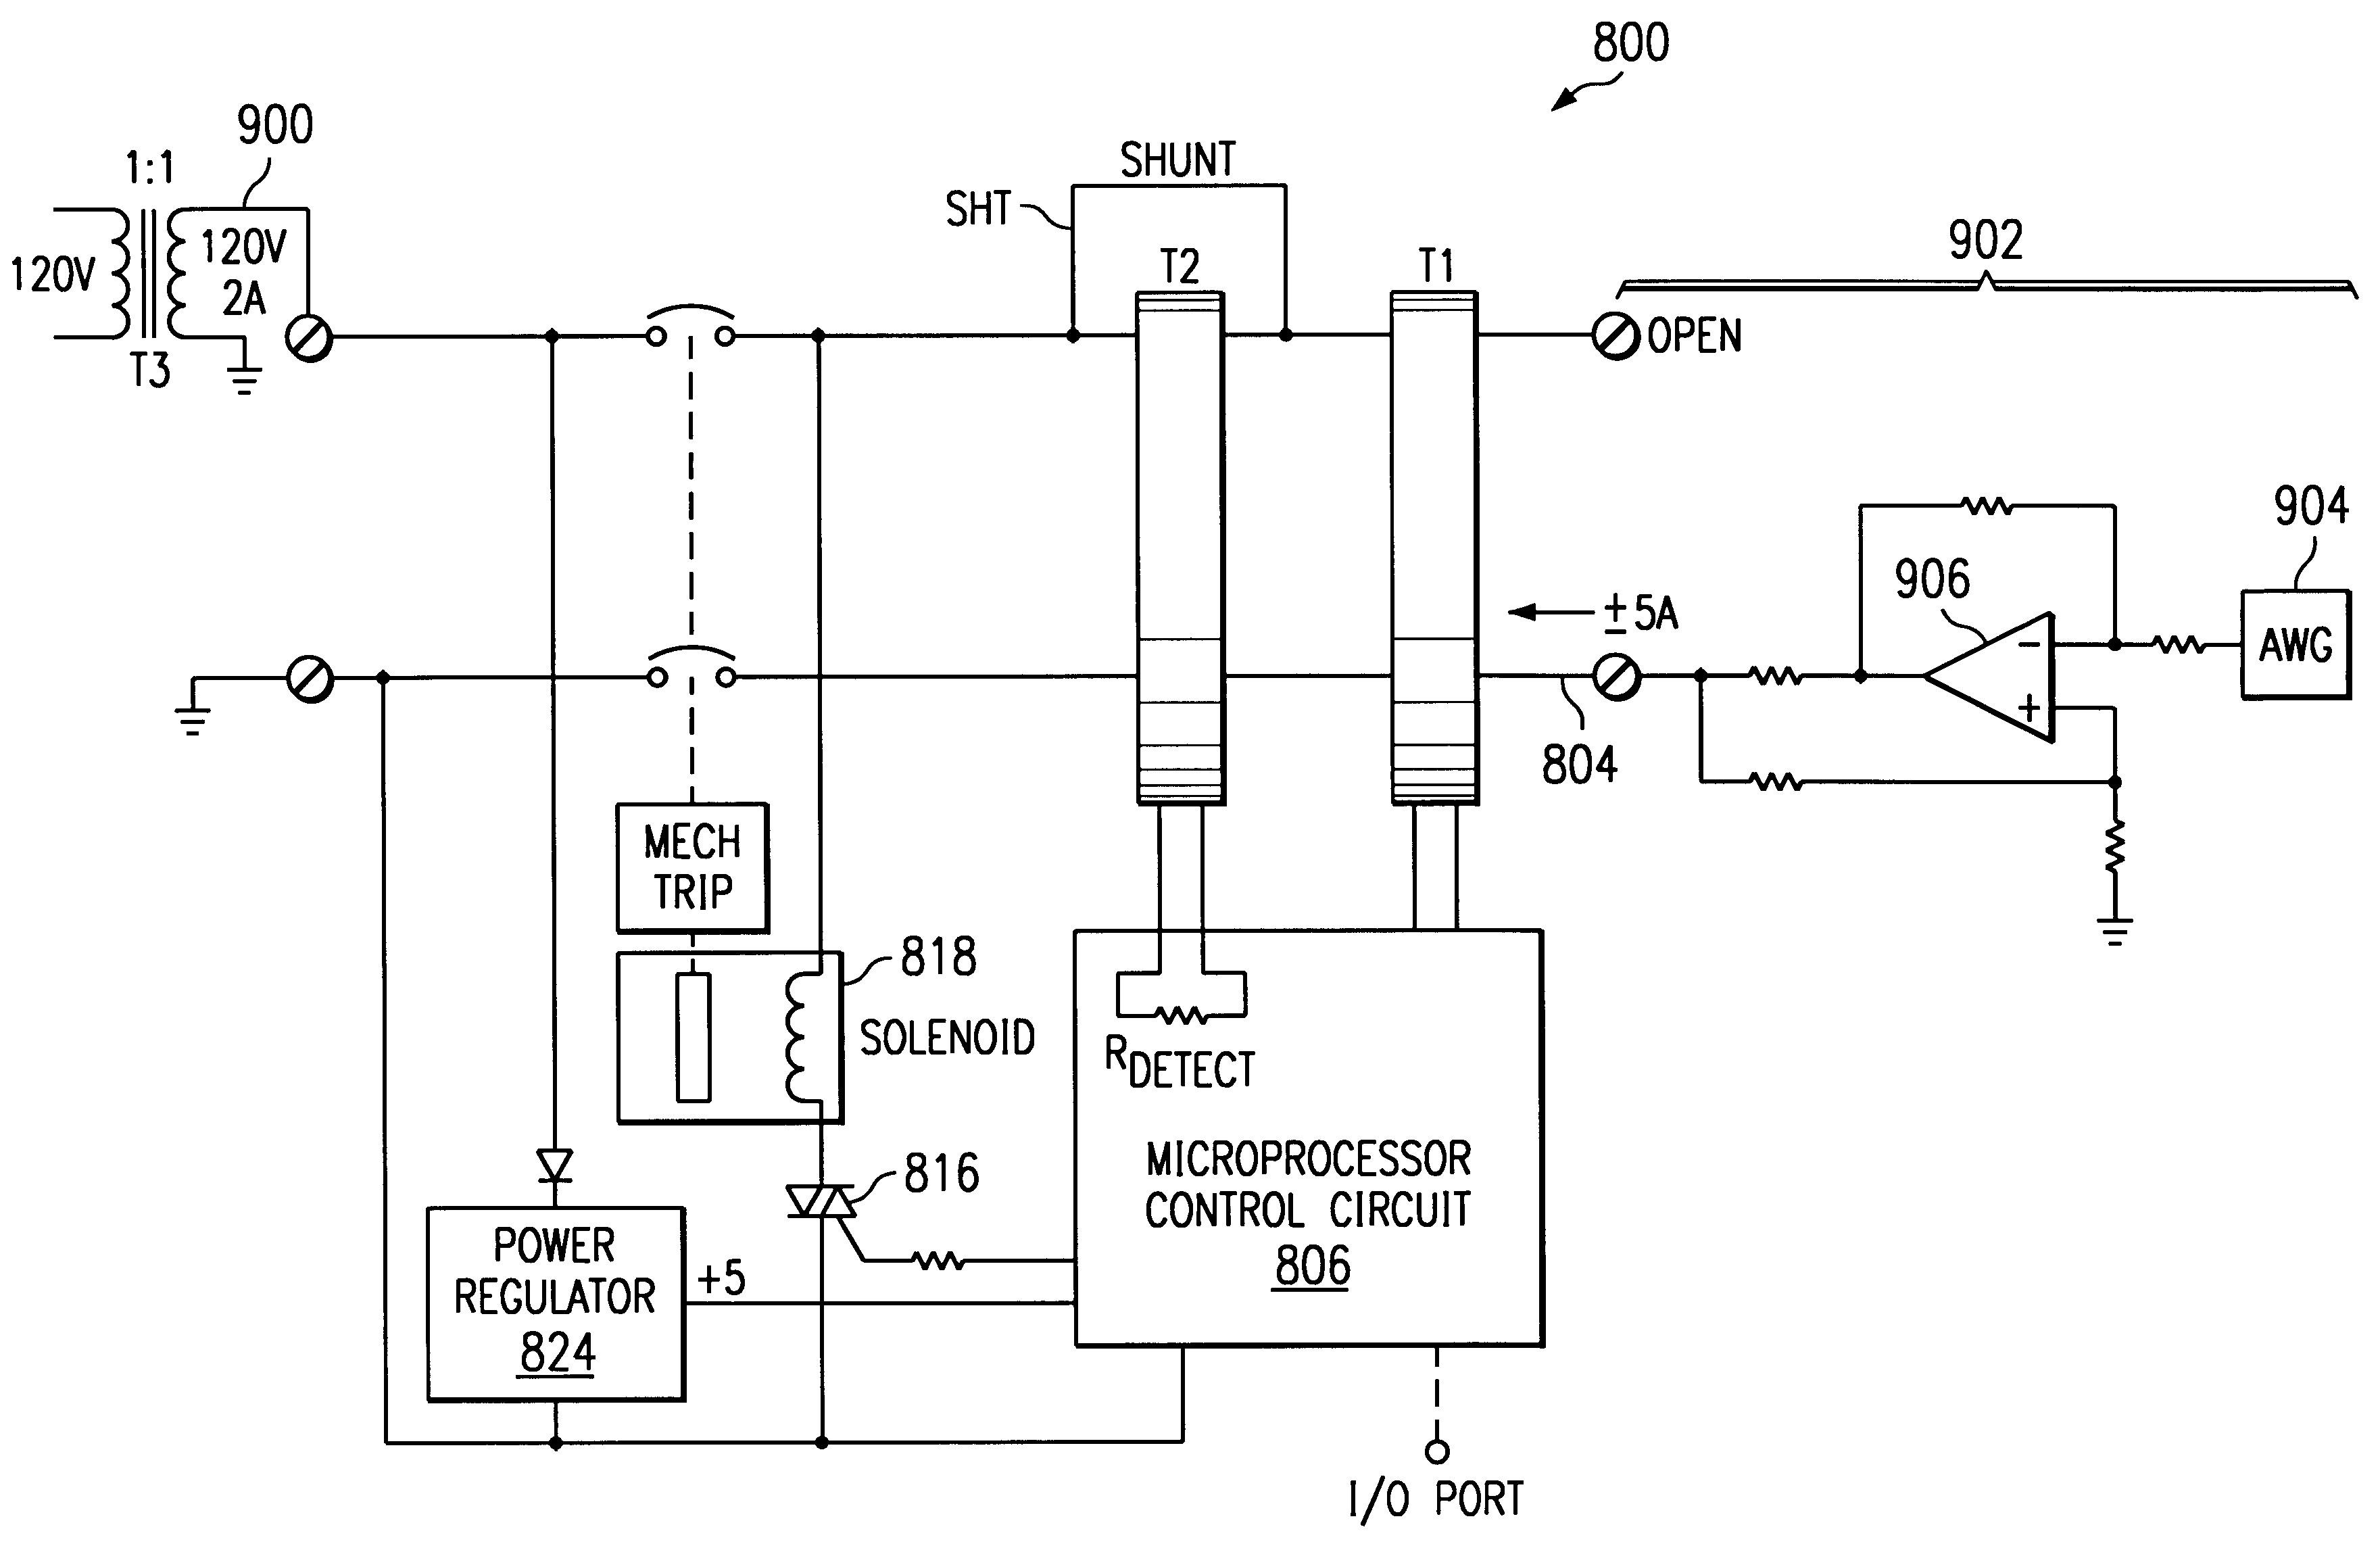 Amusing Siemens Shunt Trip Breaker Wiring Diagram 29 For Your 2002 Pt Cruiser Wiring Diagram with